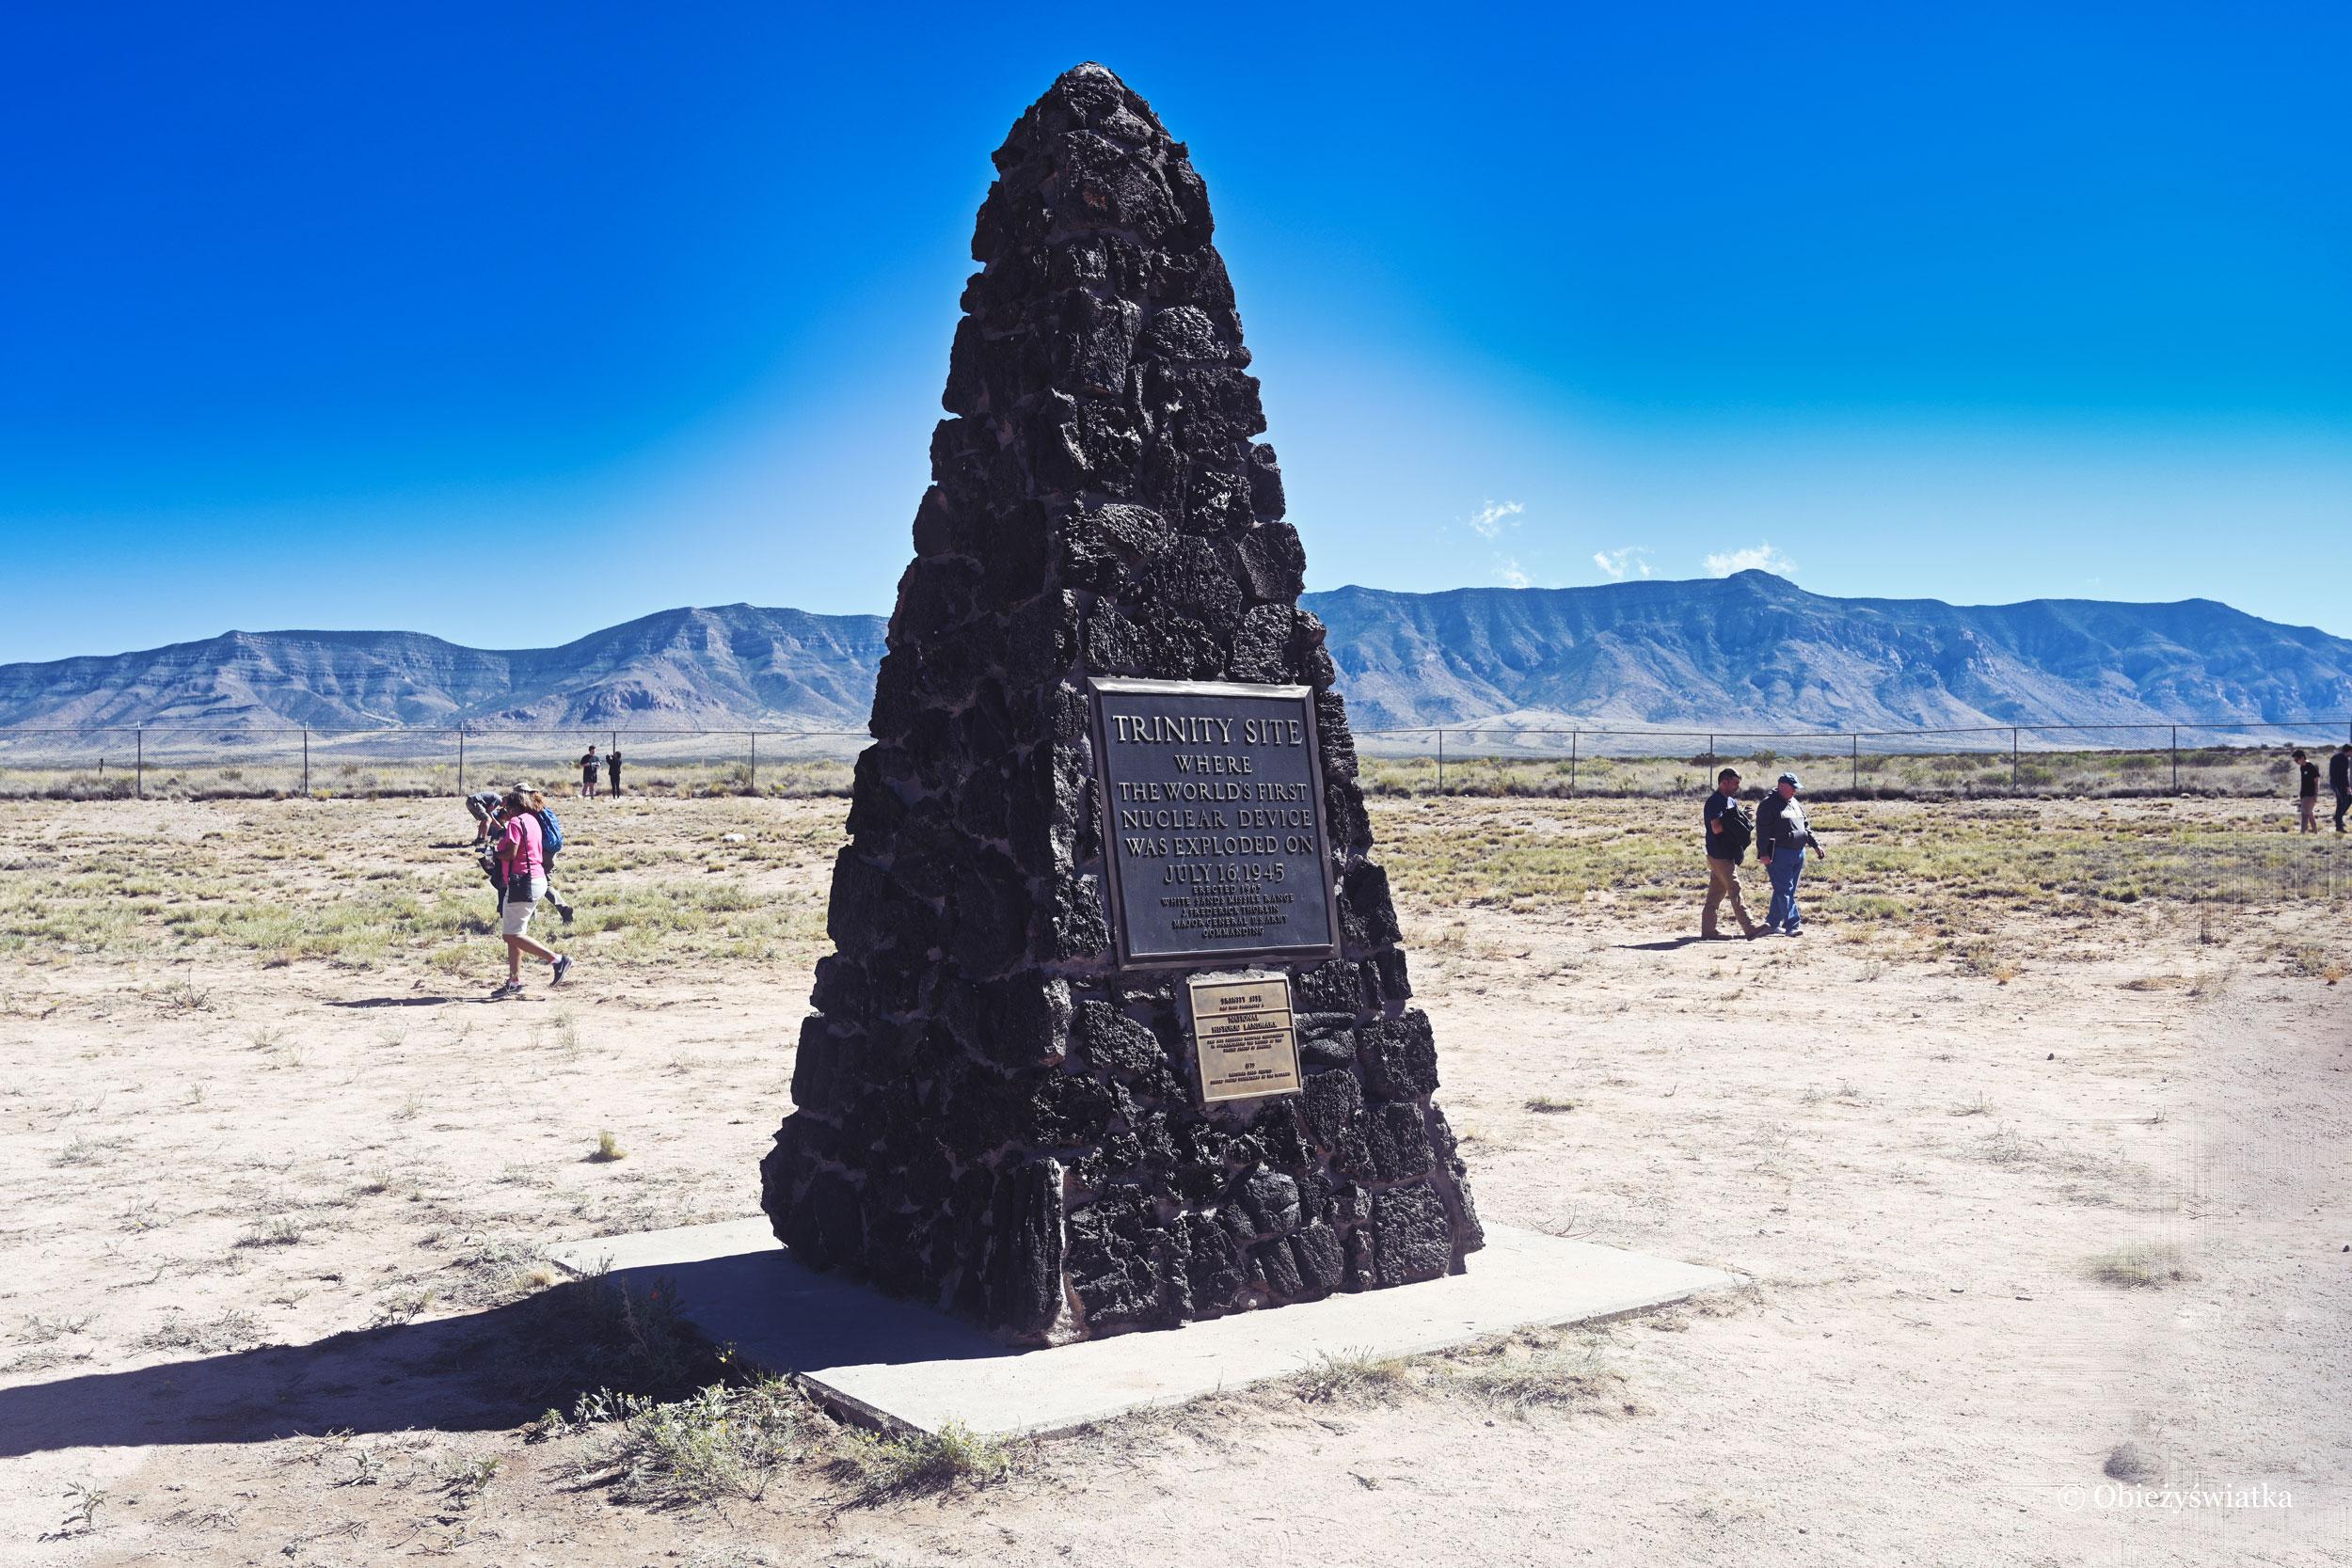 Obelisk - Trinity Test Site, Nowy Meksyk